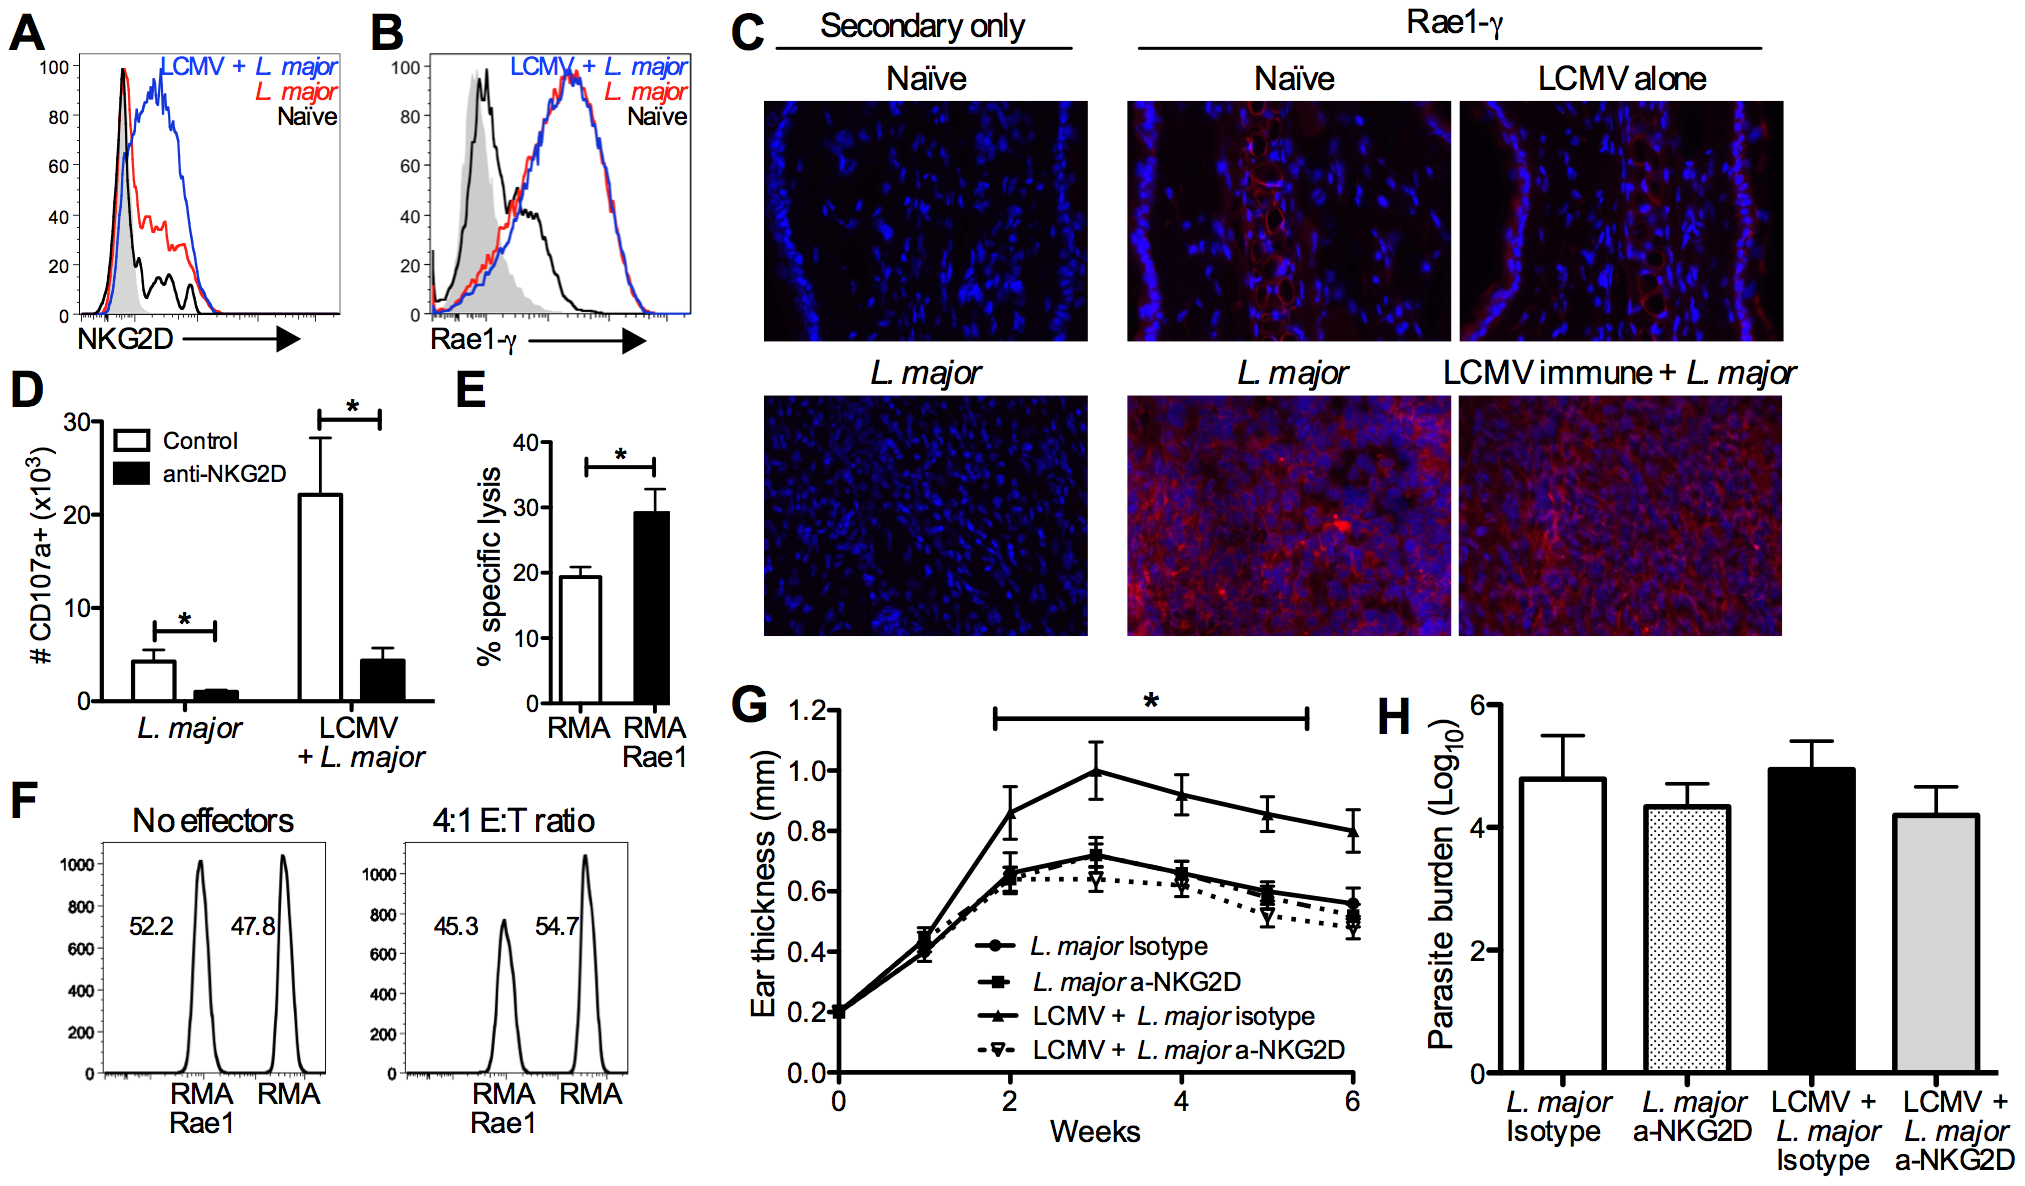 CD8 T cells induce immunopathology through engagement of NKG2D.